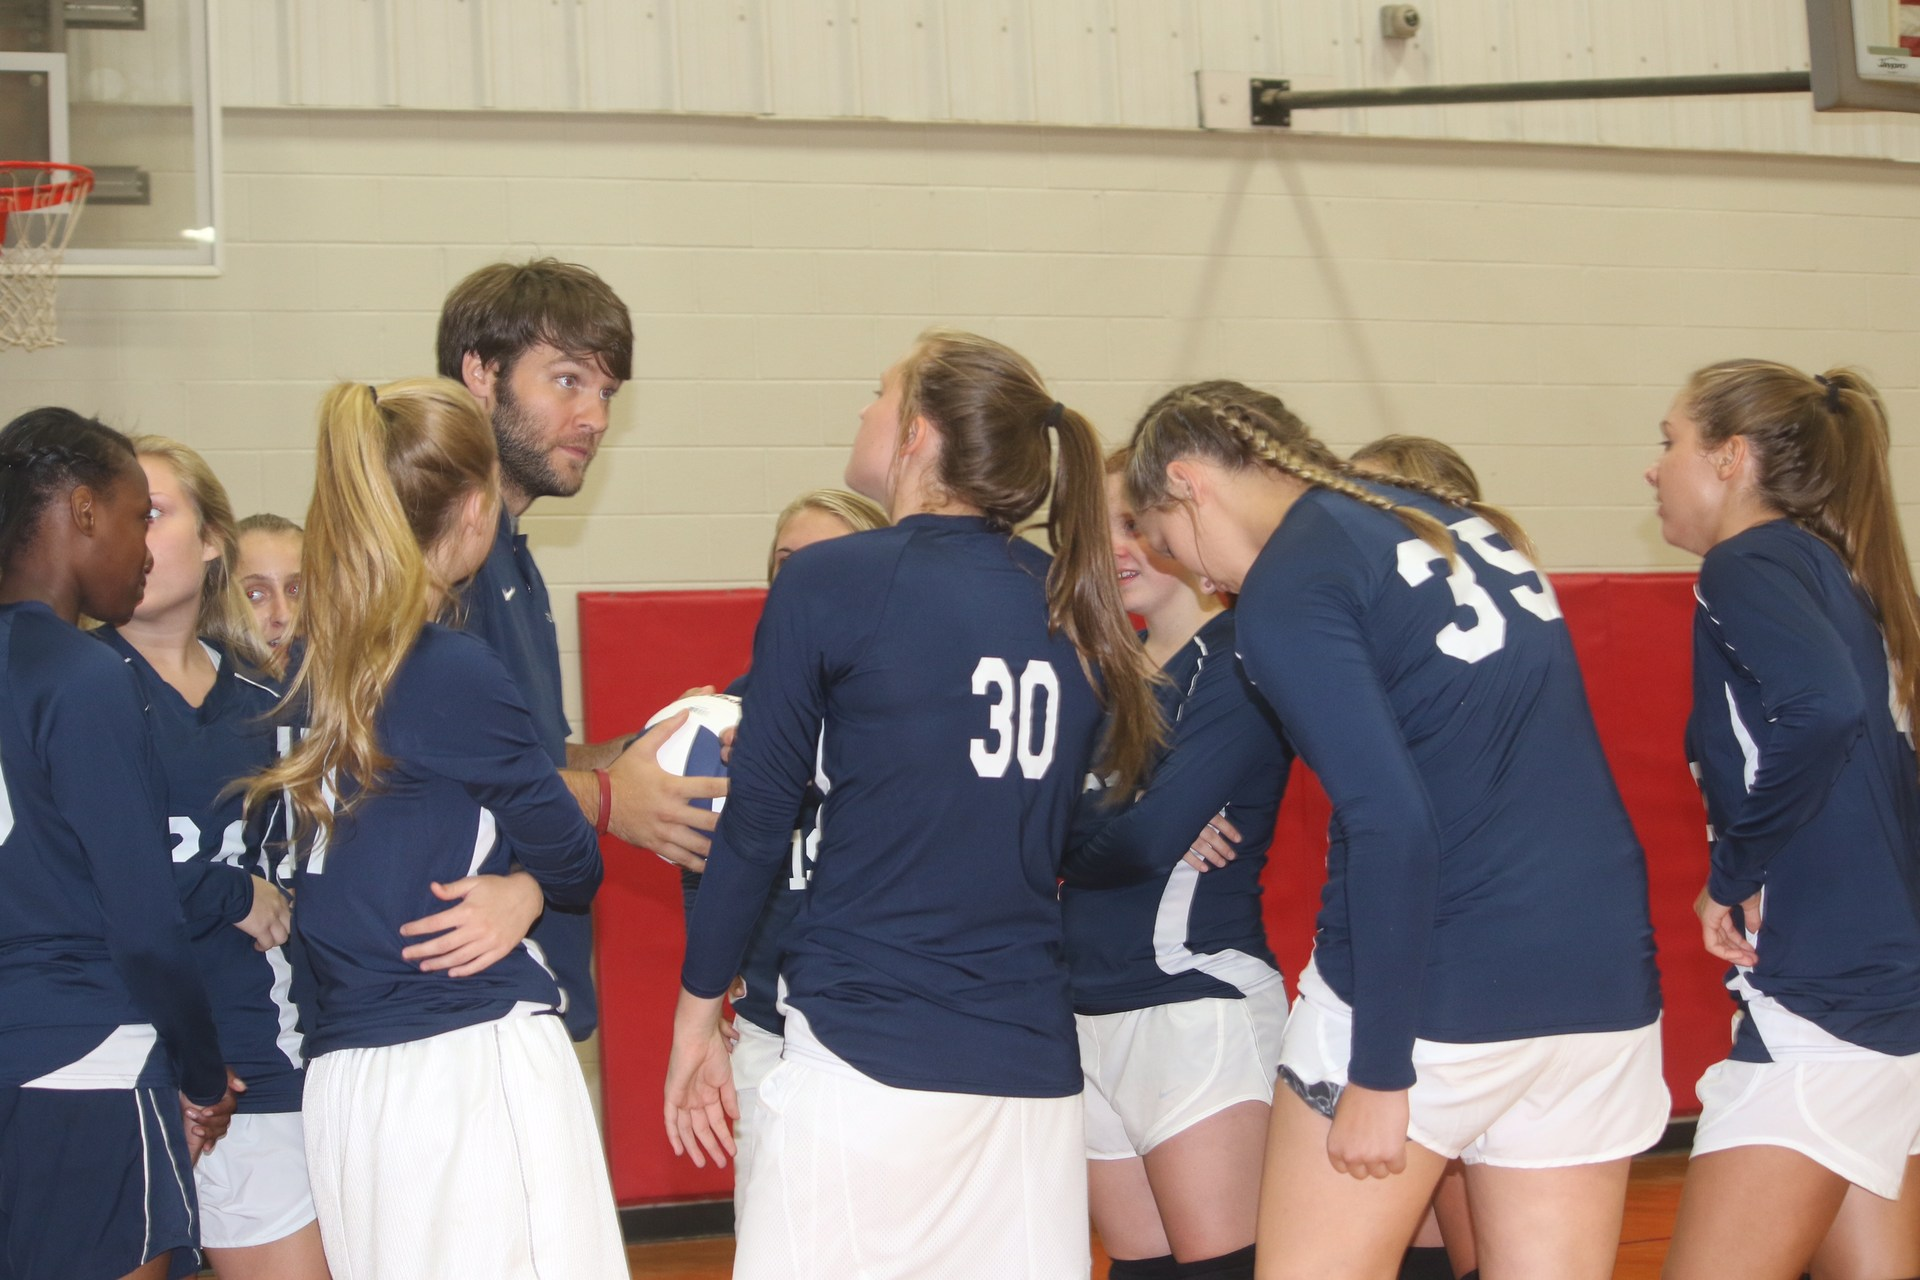 coach talking to team